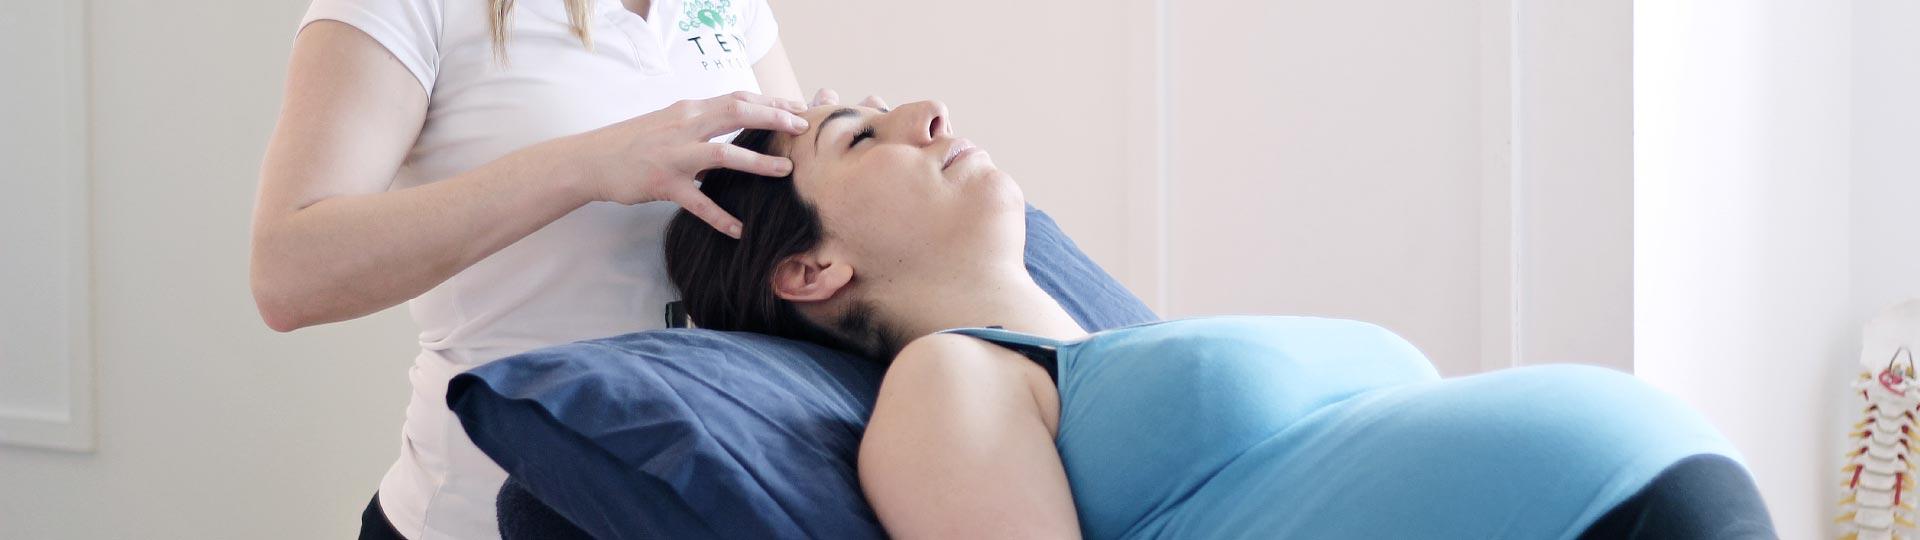 Prenatal Massage | Pregnancy Massage | London | Ten Health ...